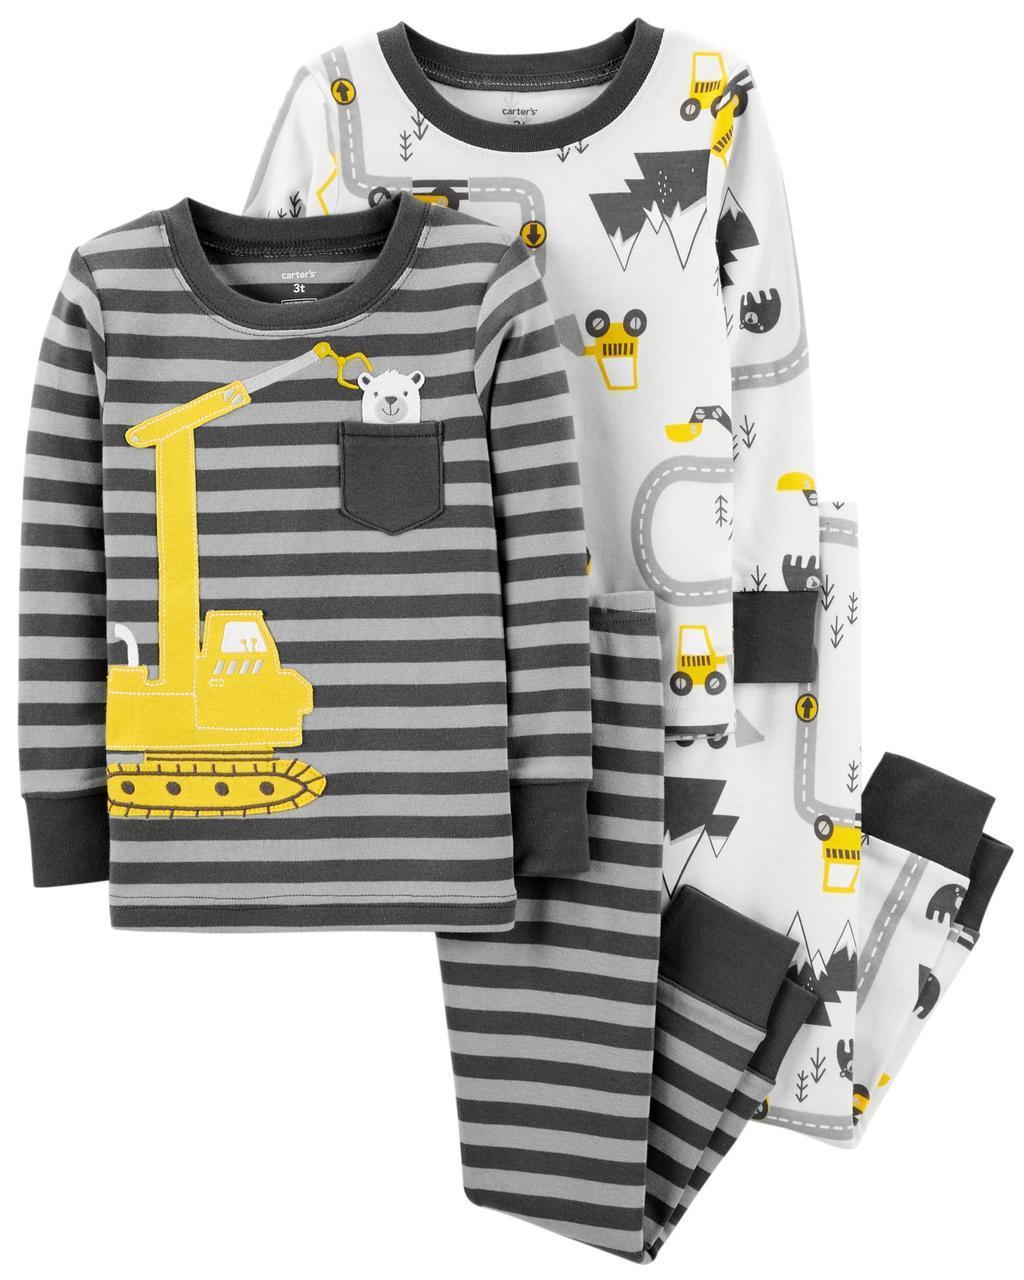 Пижама Картерс (Carter's) для мальчика 5Т